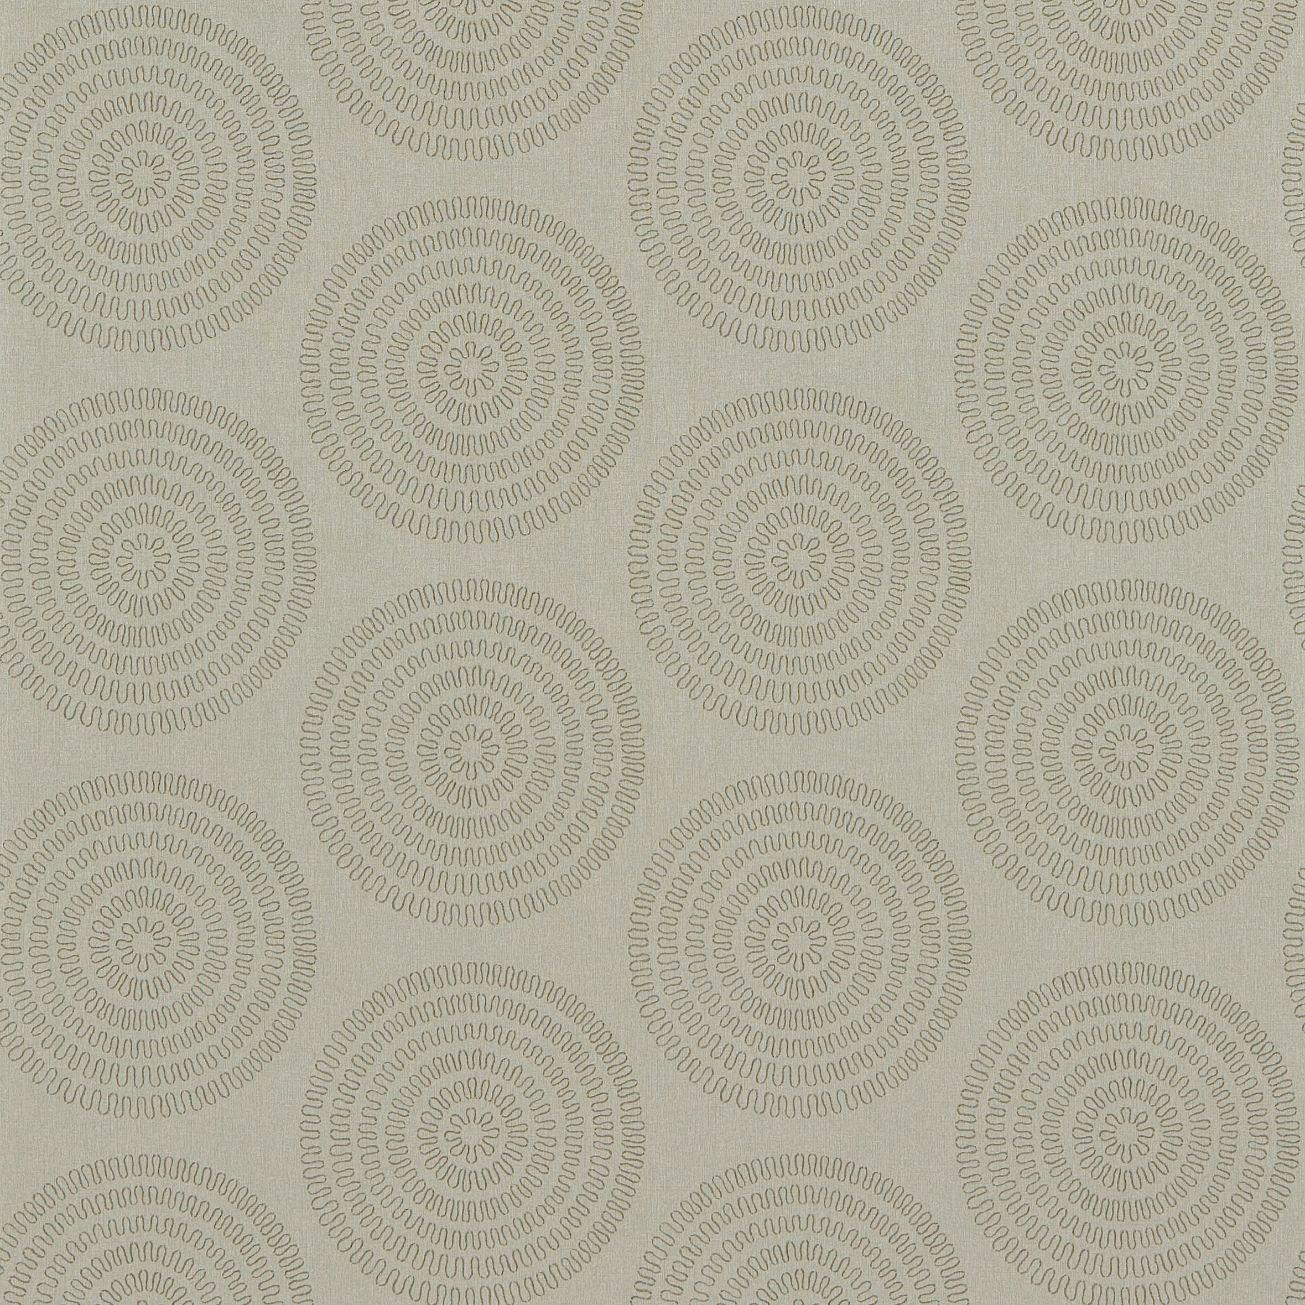 Delphi 213028